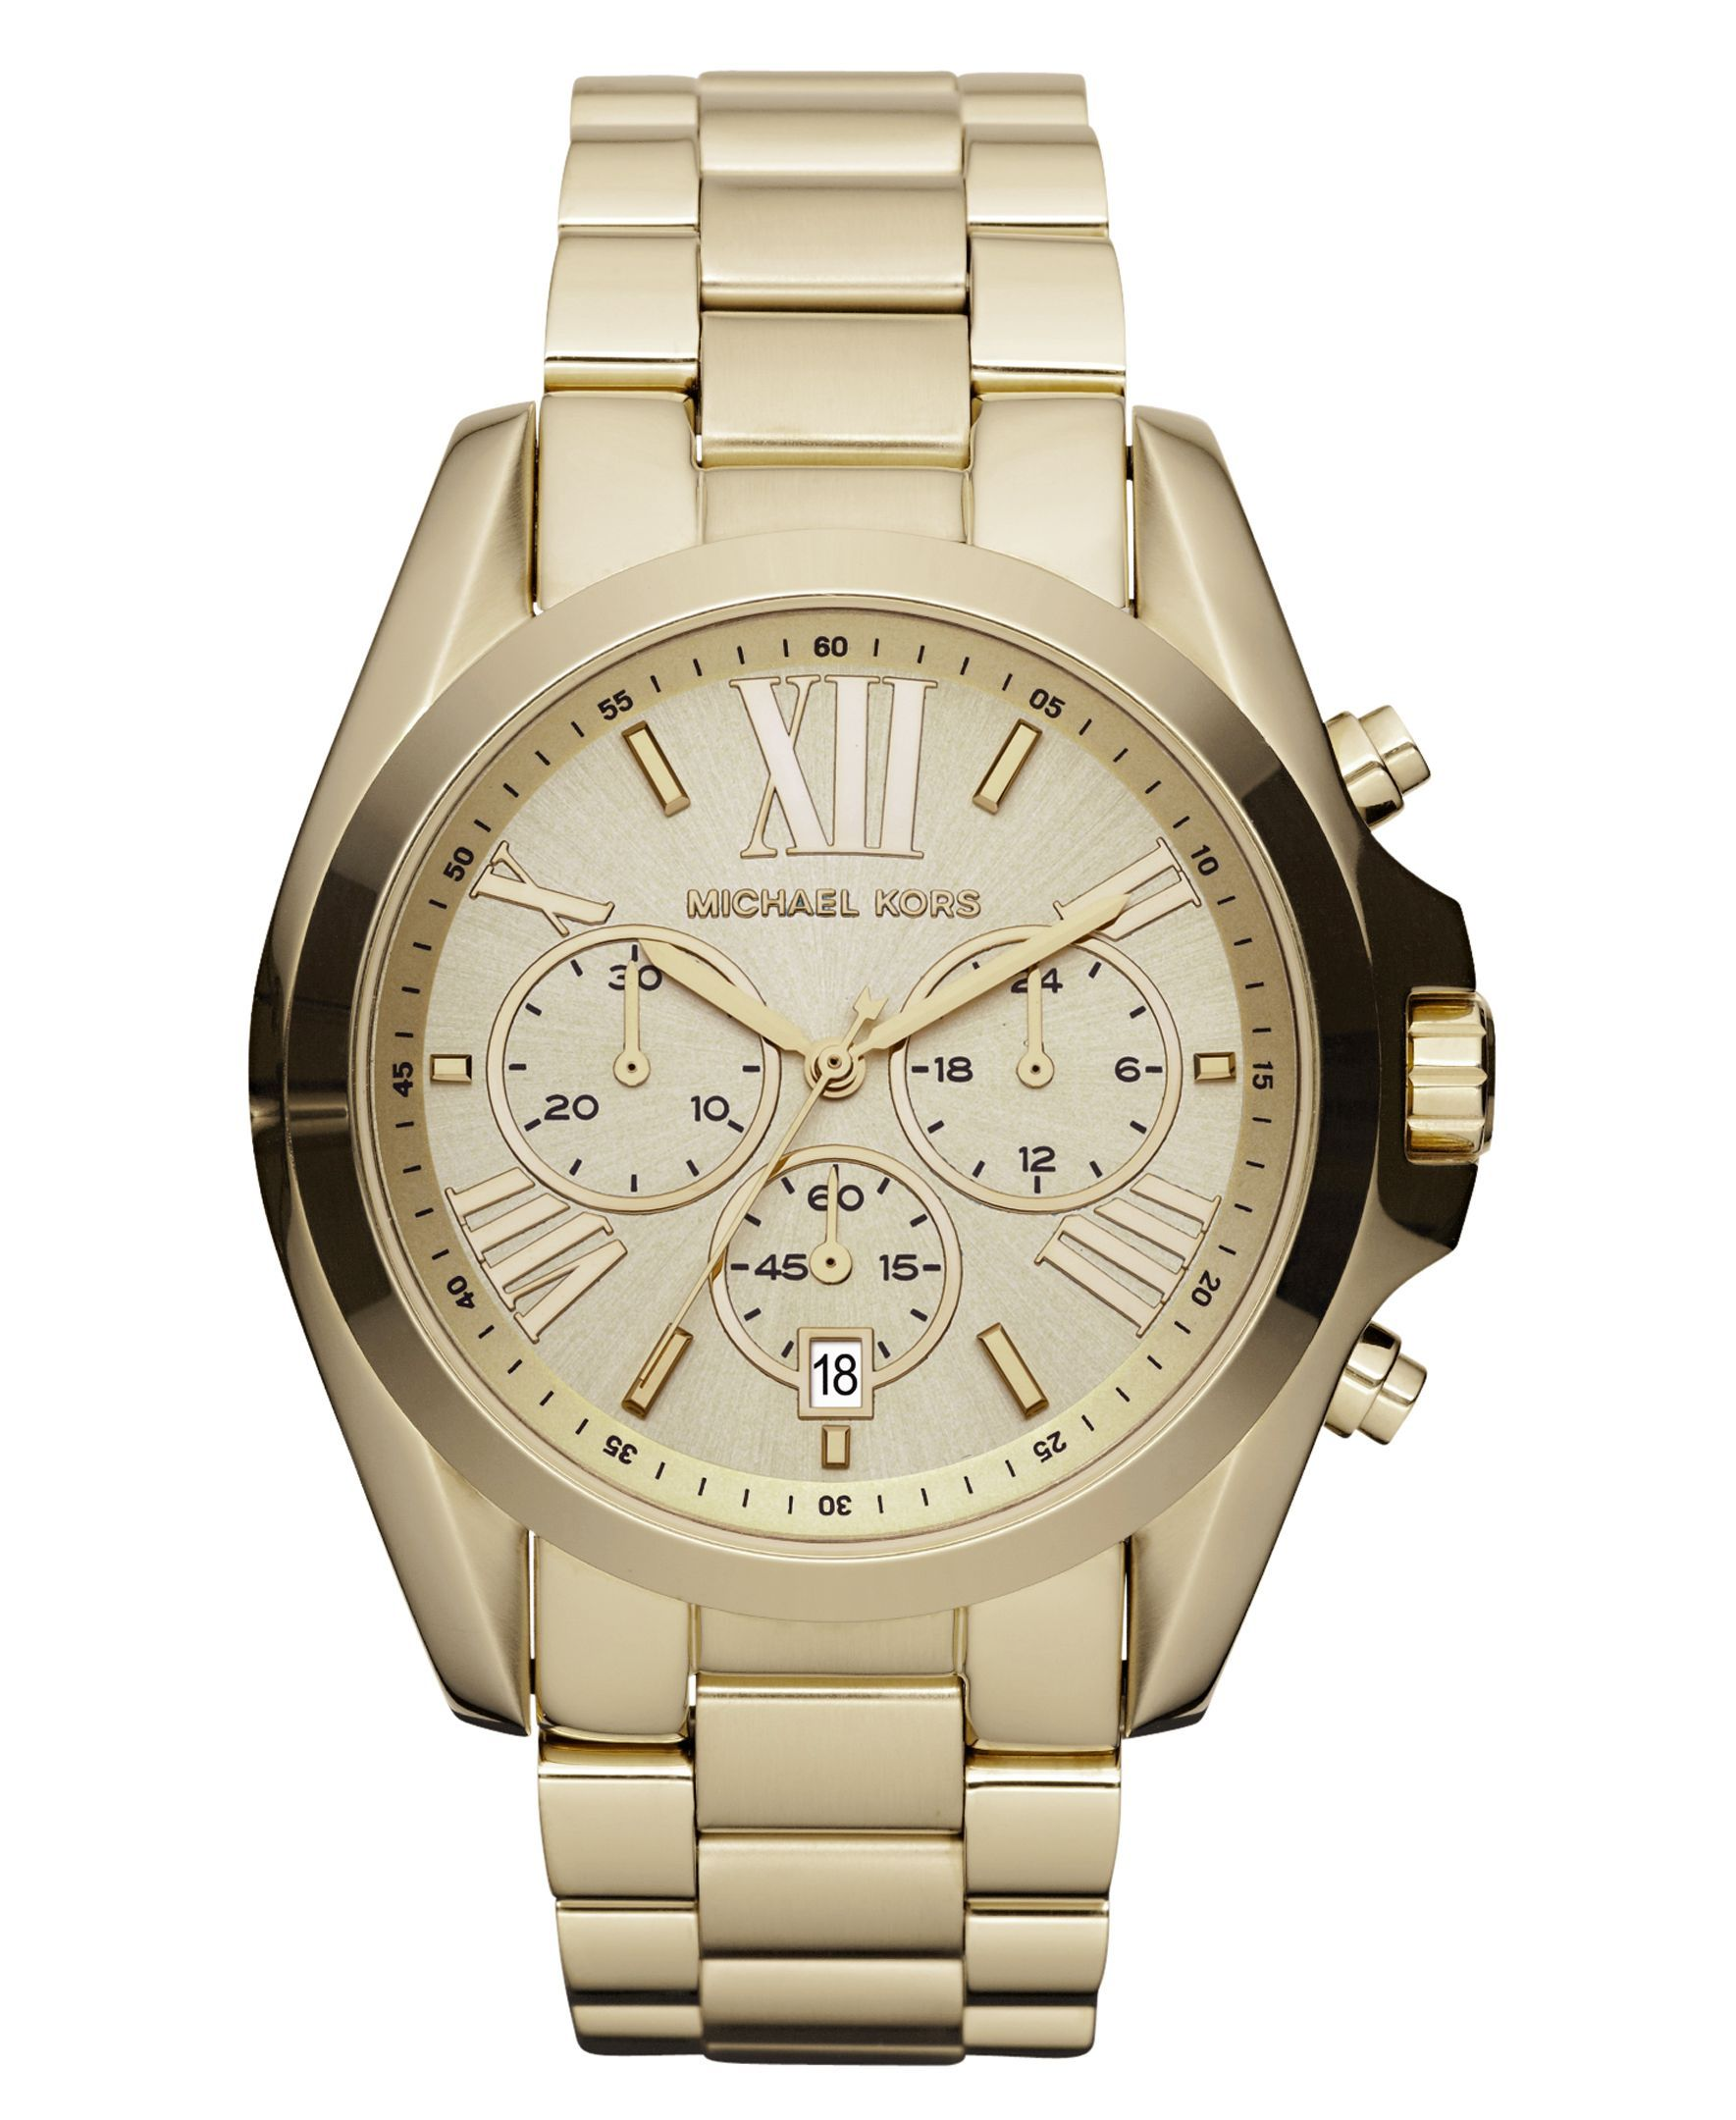 cfeff31769f2 Michael Kors Women s Chronograph Bradshaw Gold-Tone Stainless Steel  Bracelet Watch 43mm MK5605